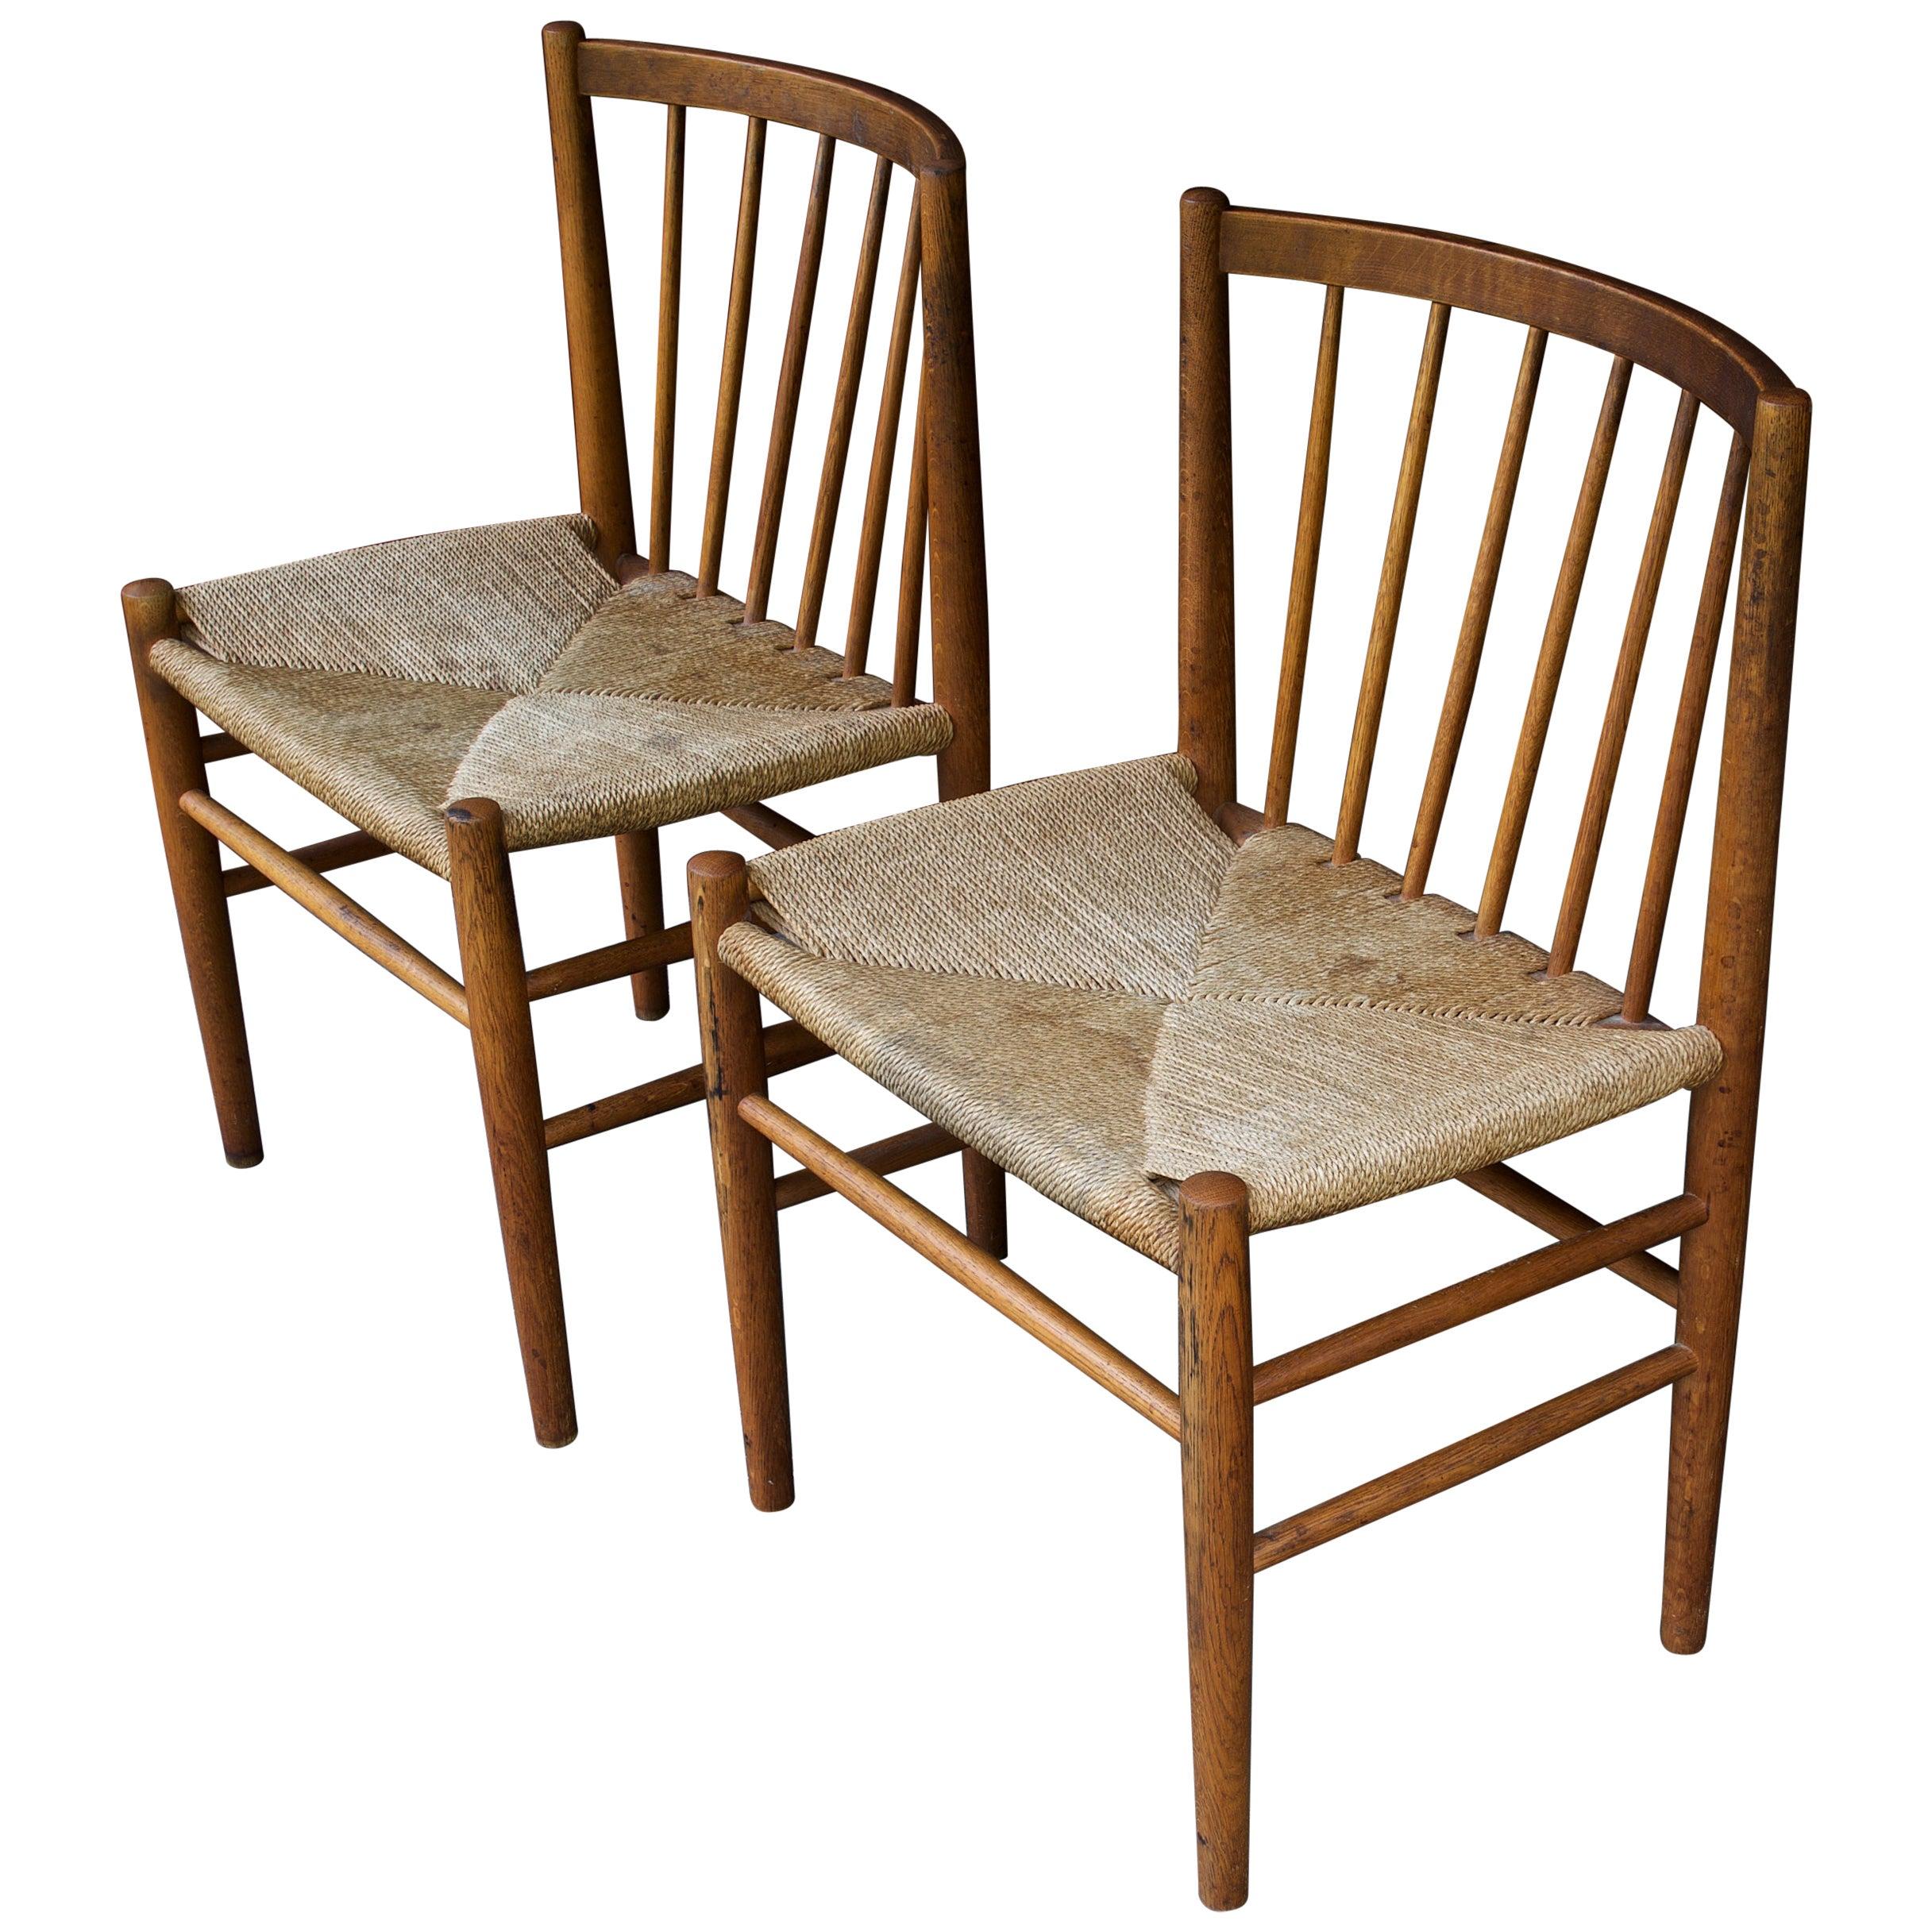 1950s Oak Rope Scandinavian Danish Dining Chair Cabin Architect Rustic Farmhouse